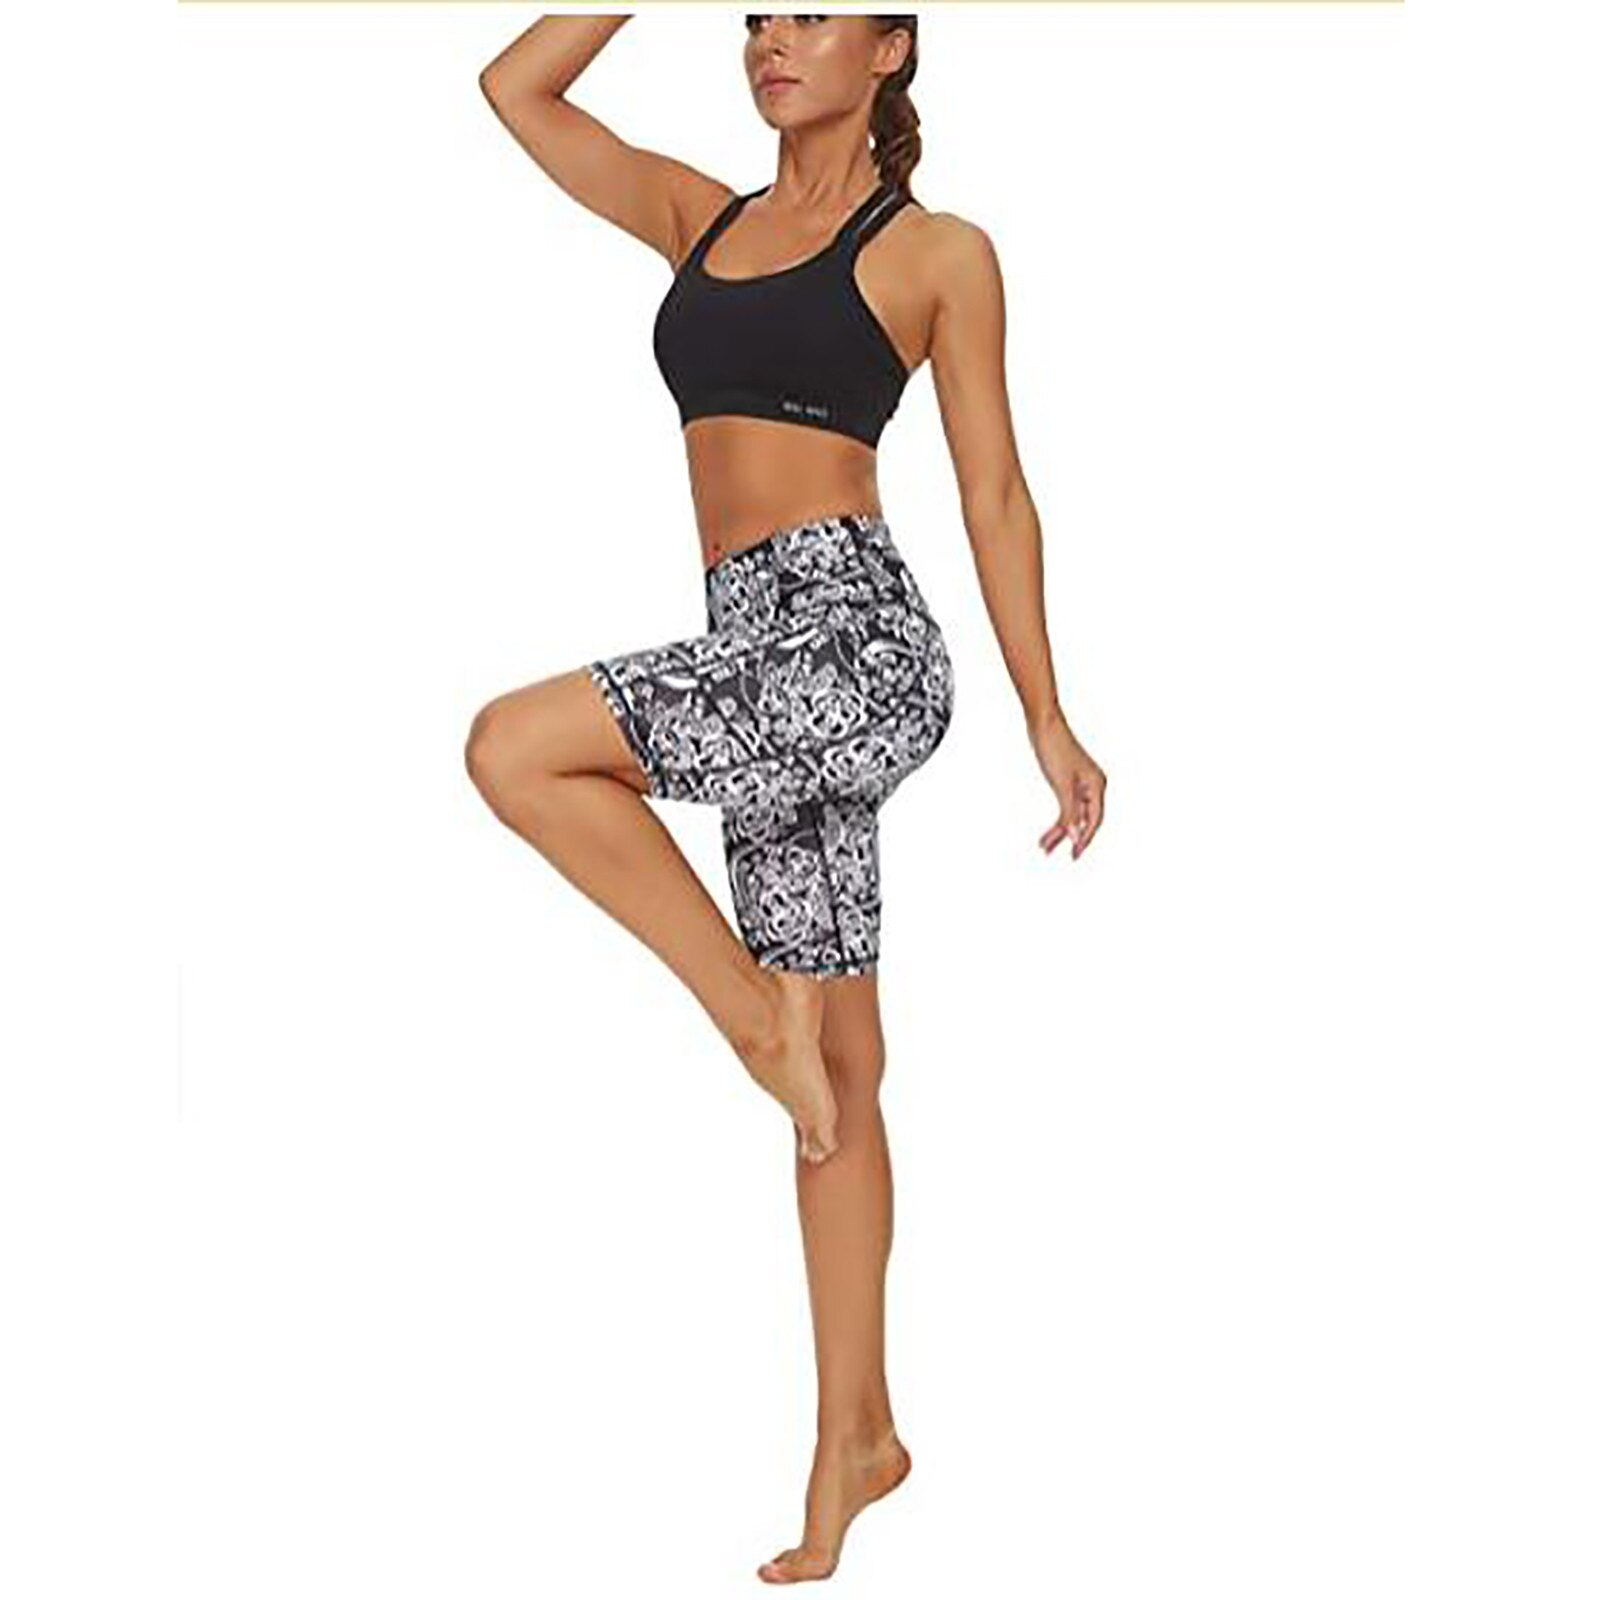 Sexy Seamless Legging Women's Printed High Waist Skinny Hips Comfortable Sports Sport ShortsWoman Sexy High Waist Pants